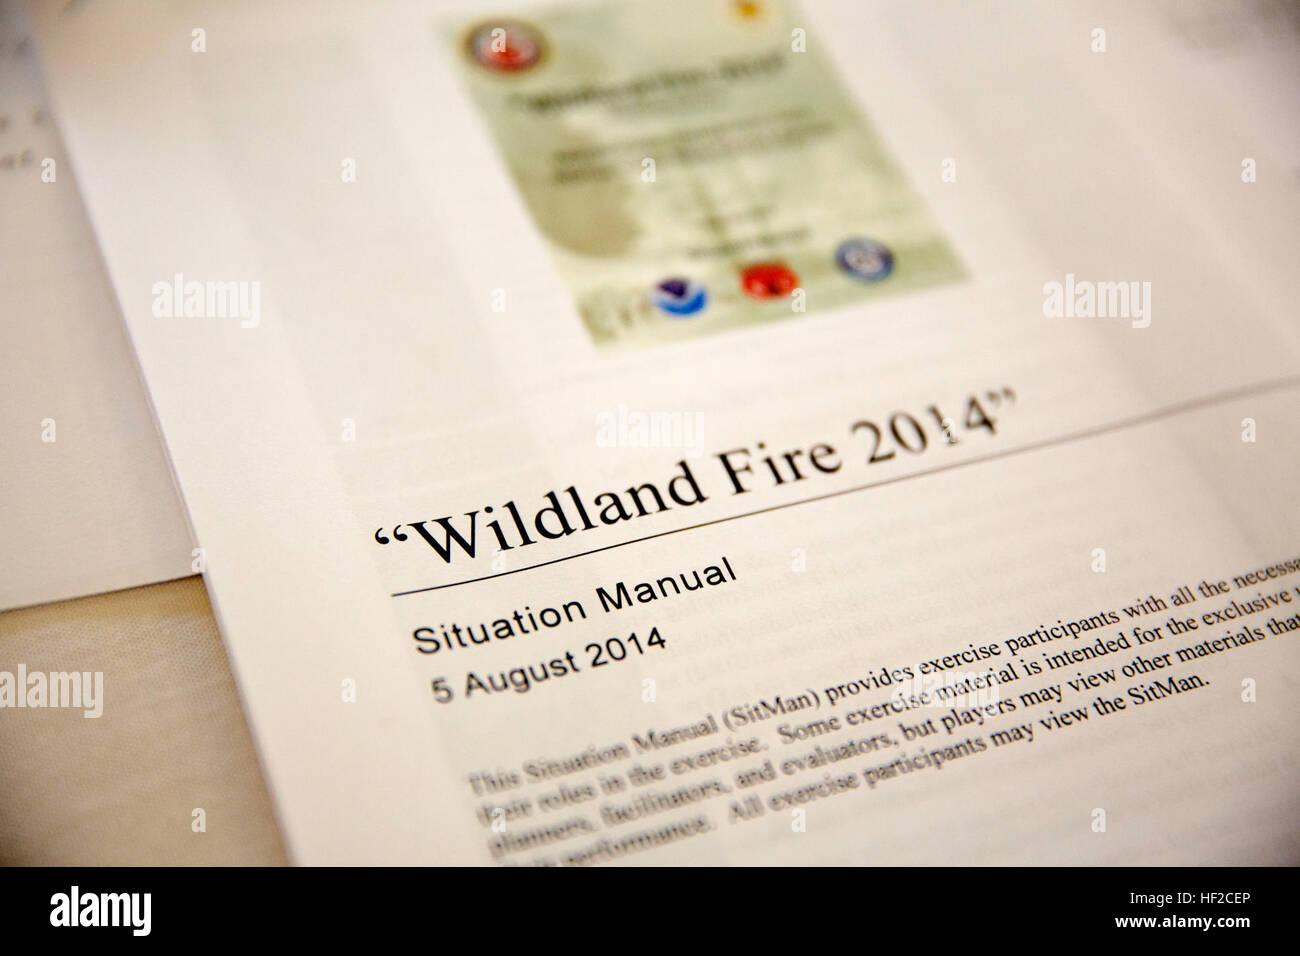 Wildland Fire Stock Photos & Wildland Fire Stock Images - Alamy